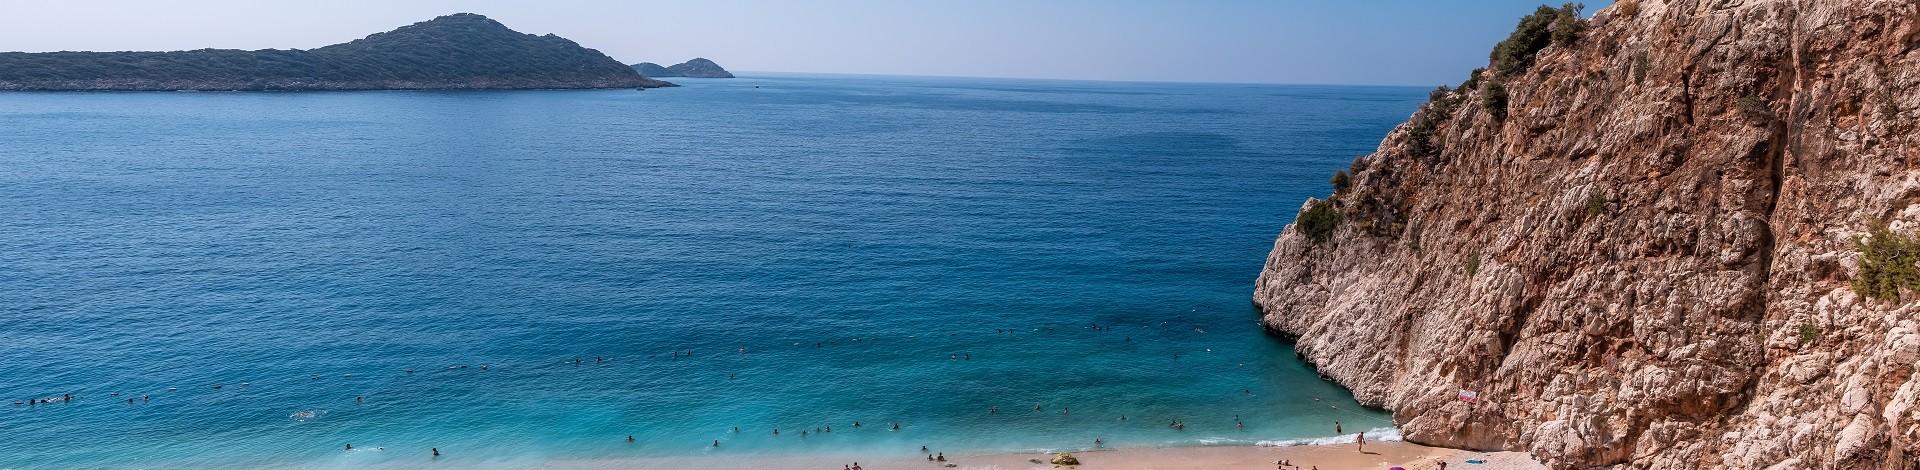 Kaputaş Plajı, Antalya